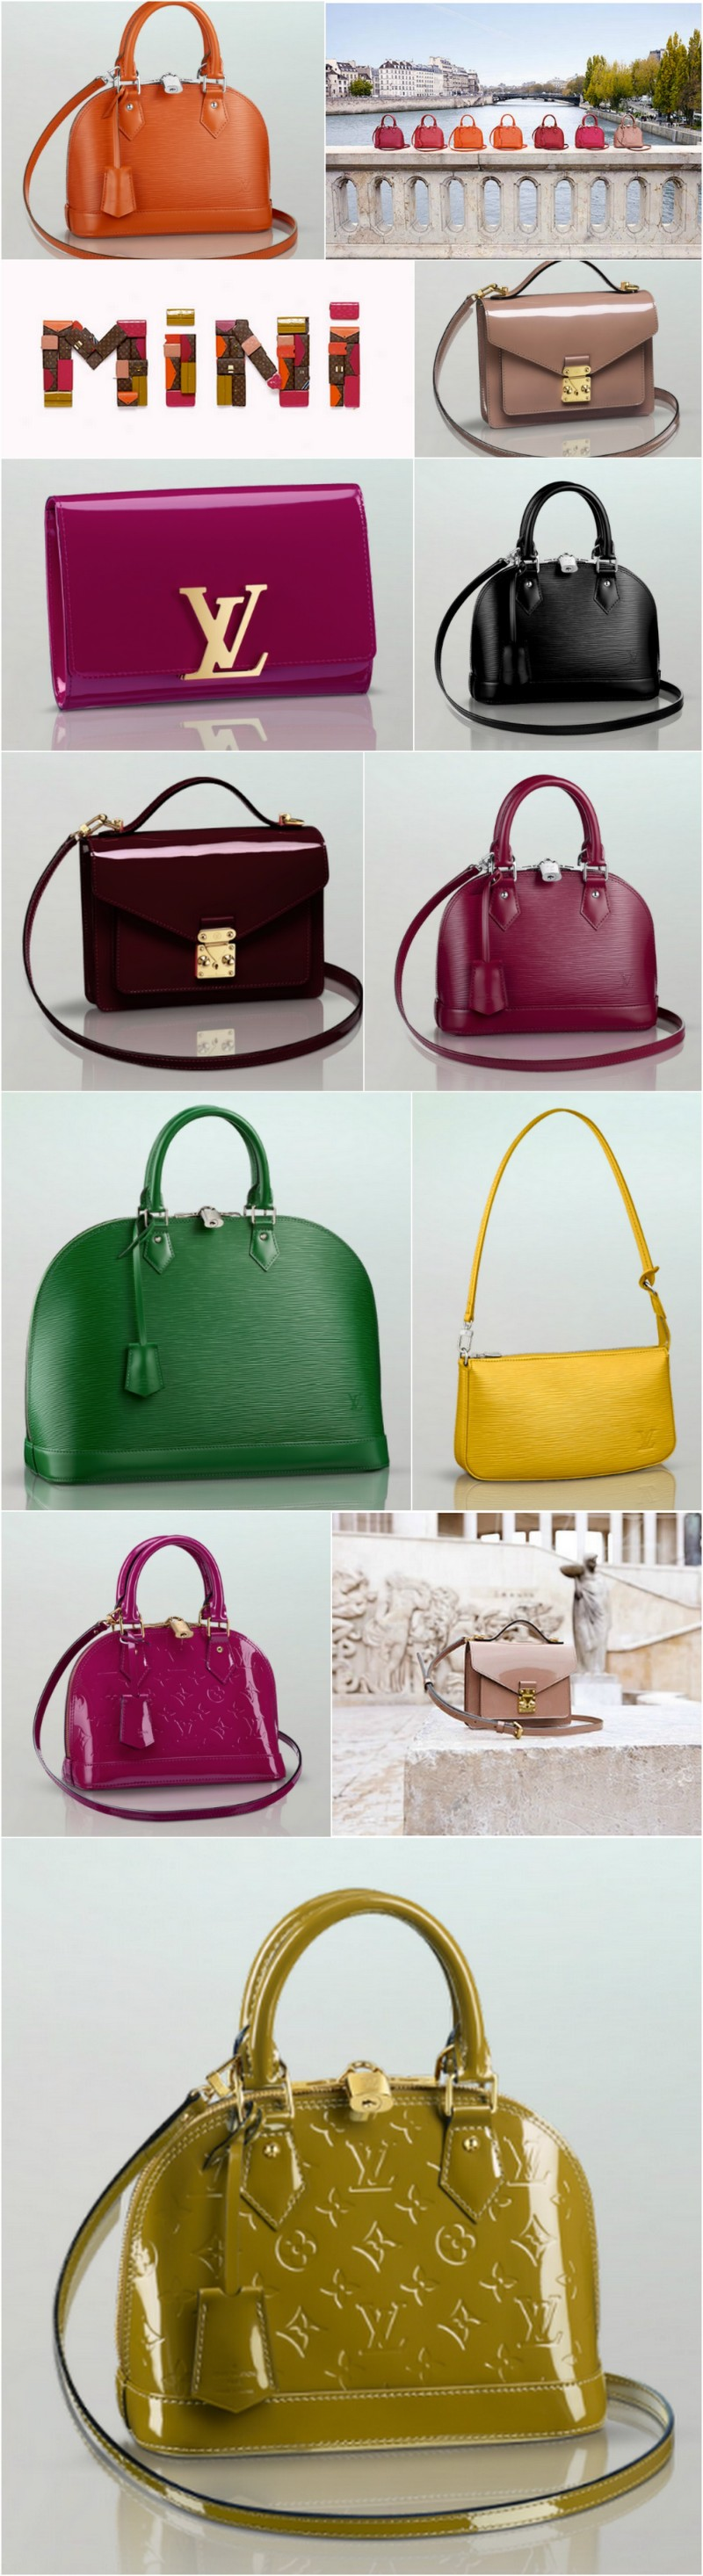 louis Vuitton mini bags